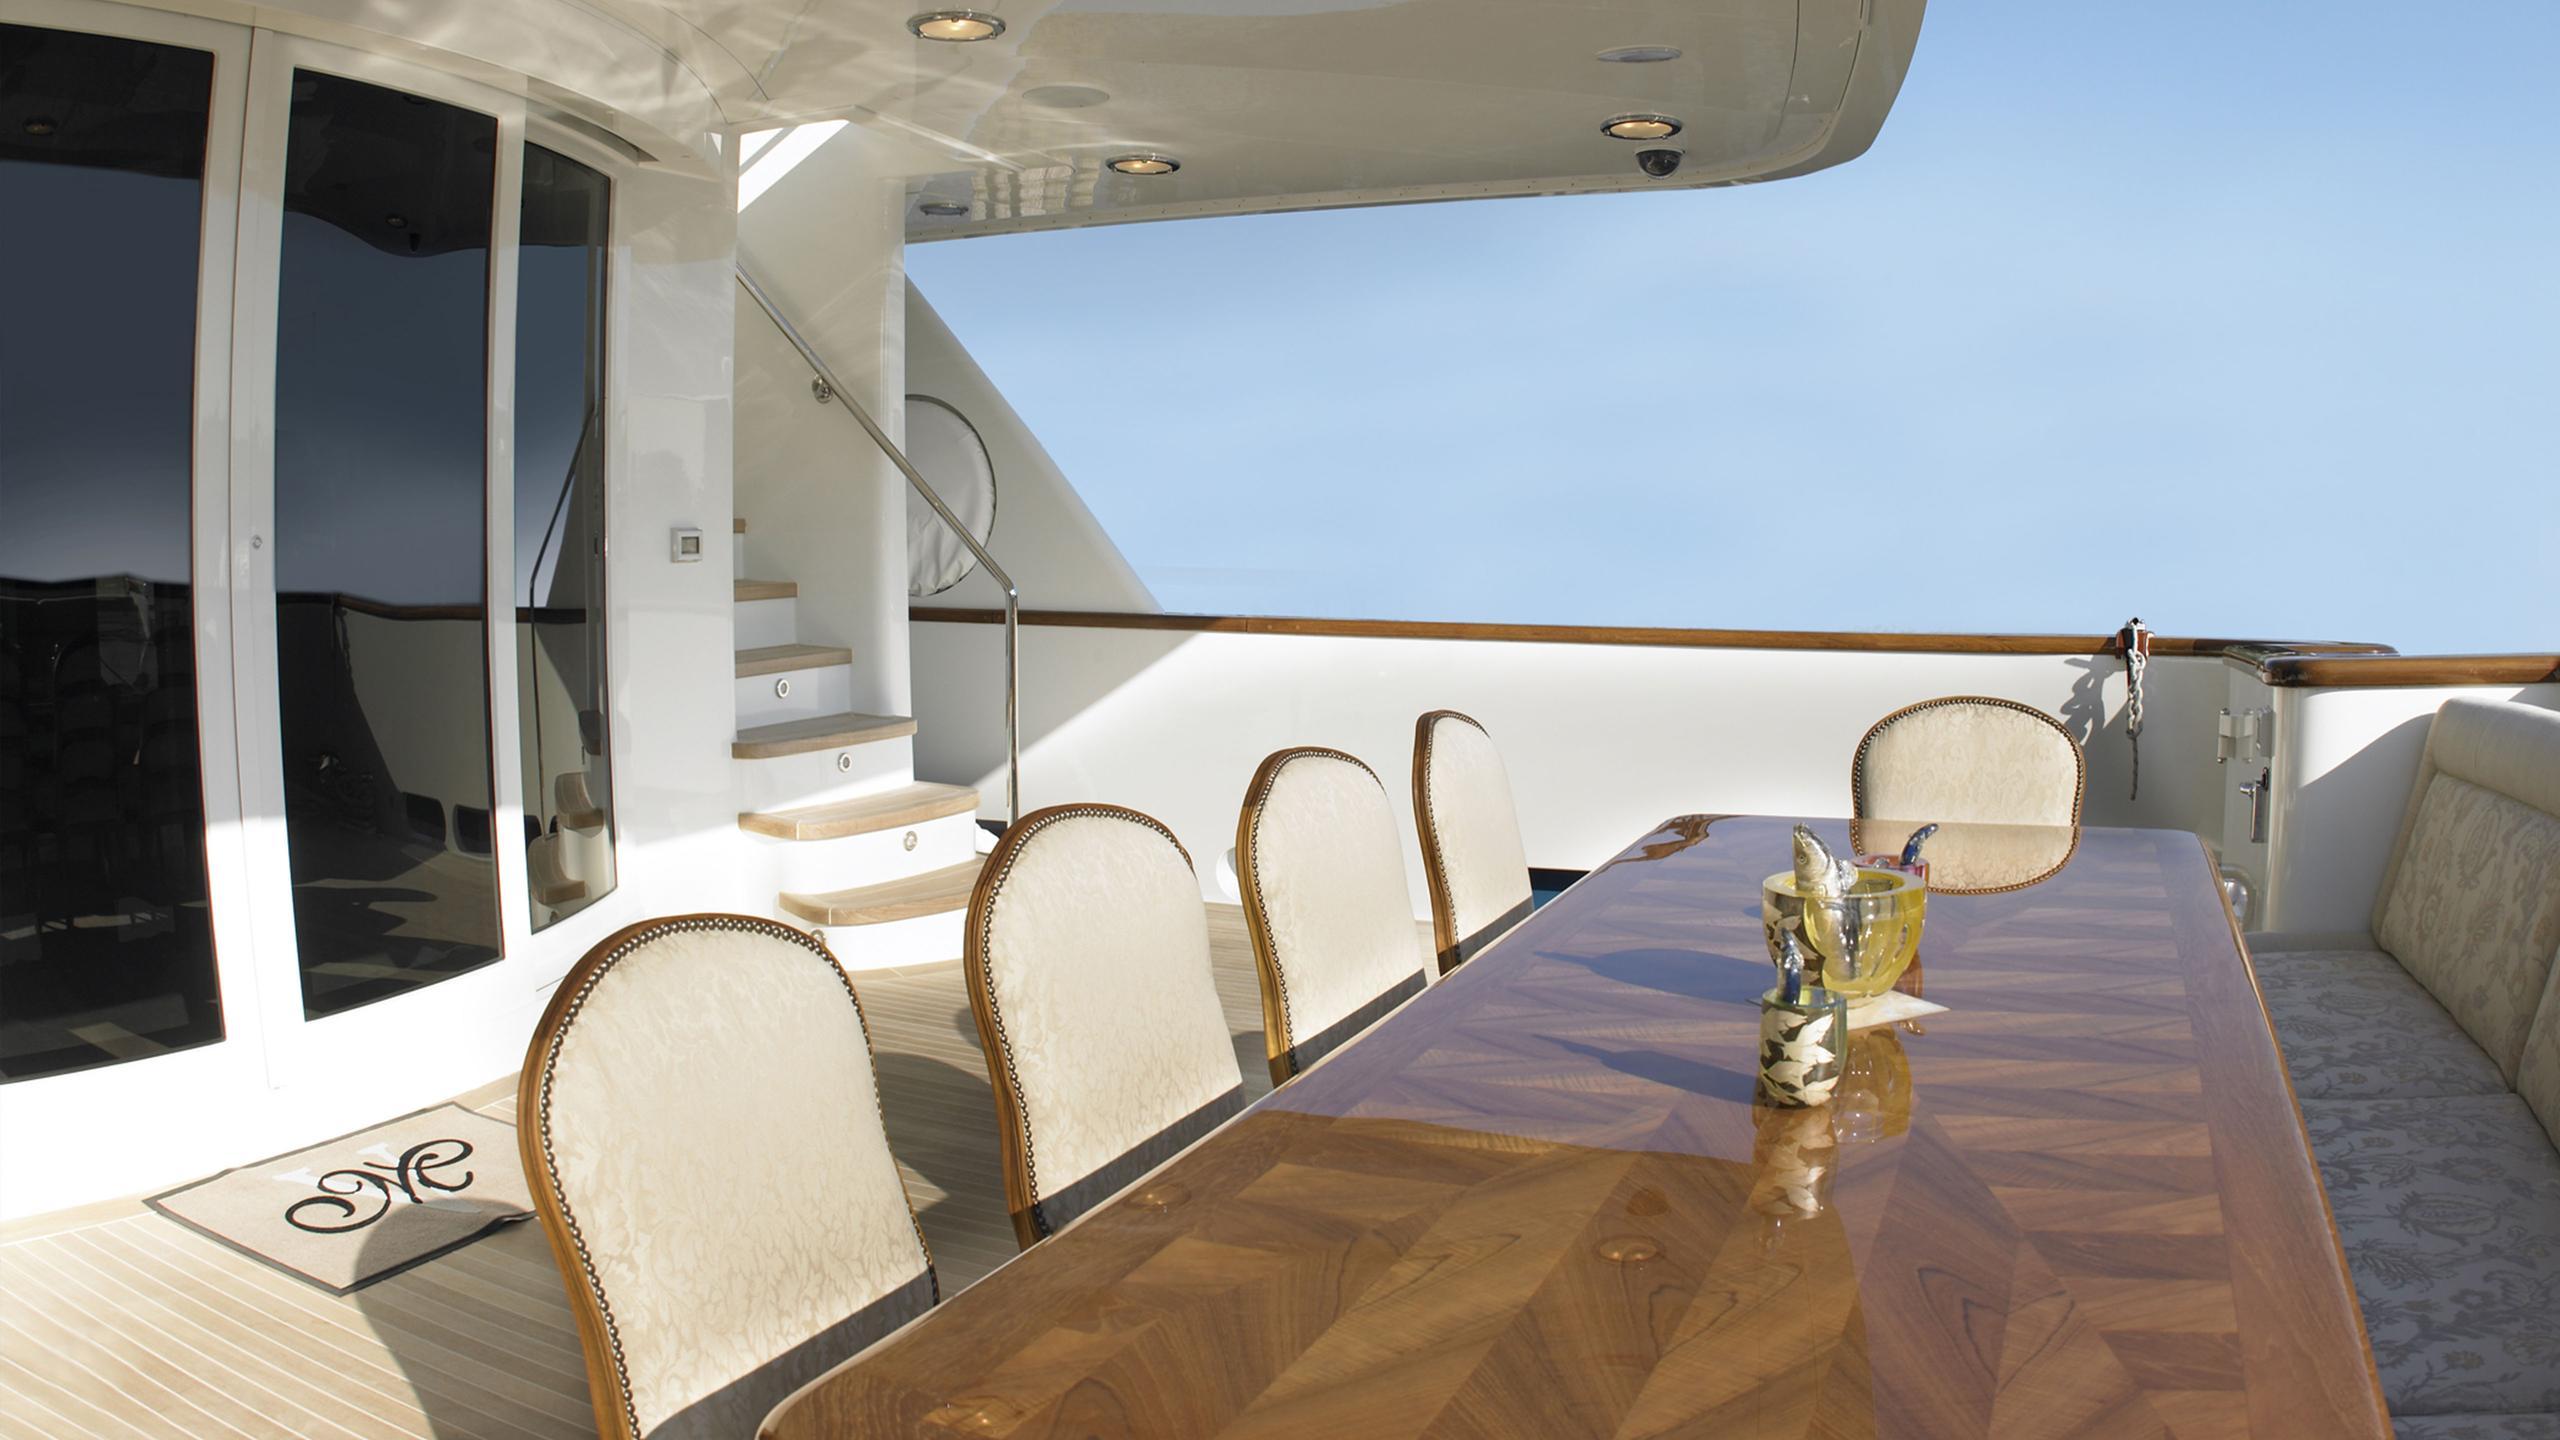 maghreb-v-yacht-aft-deck